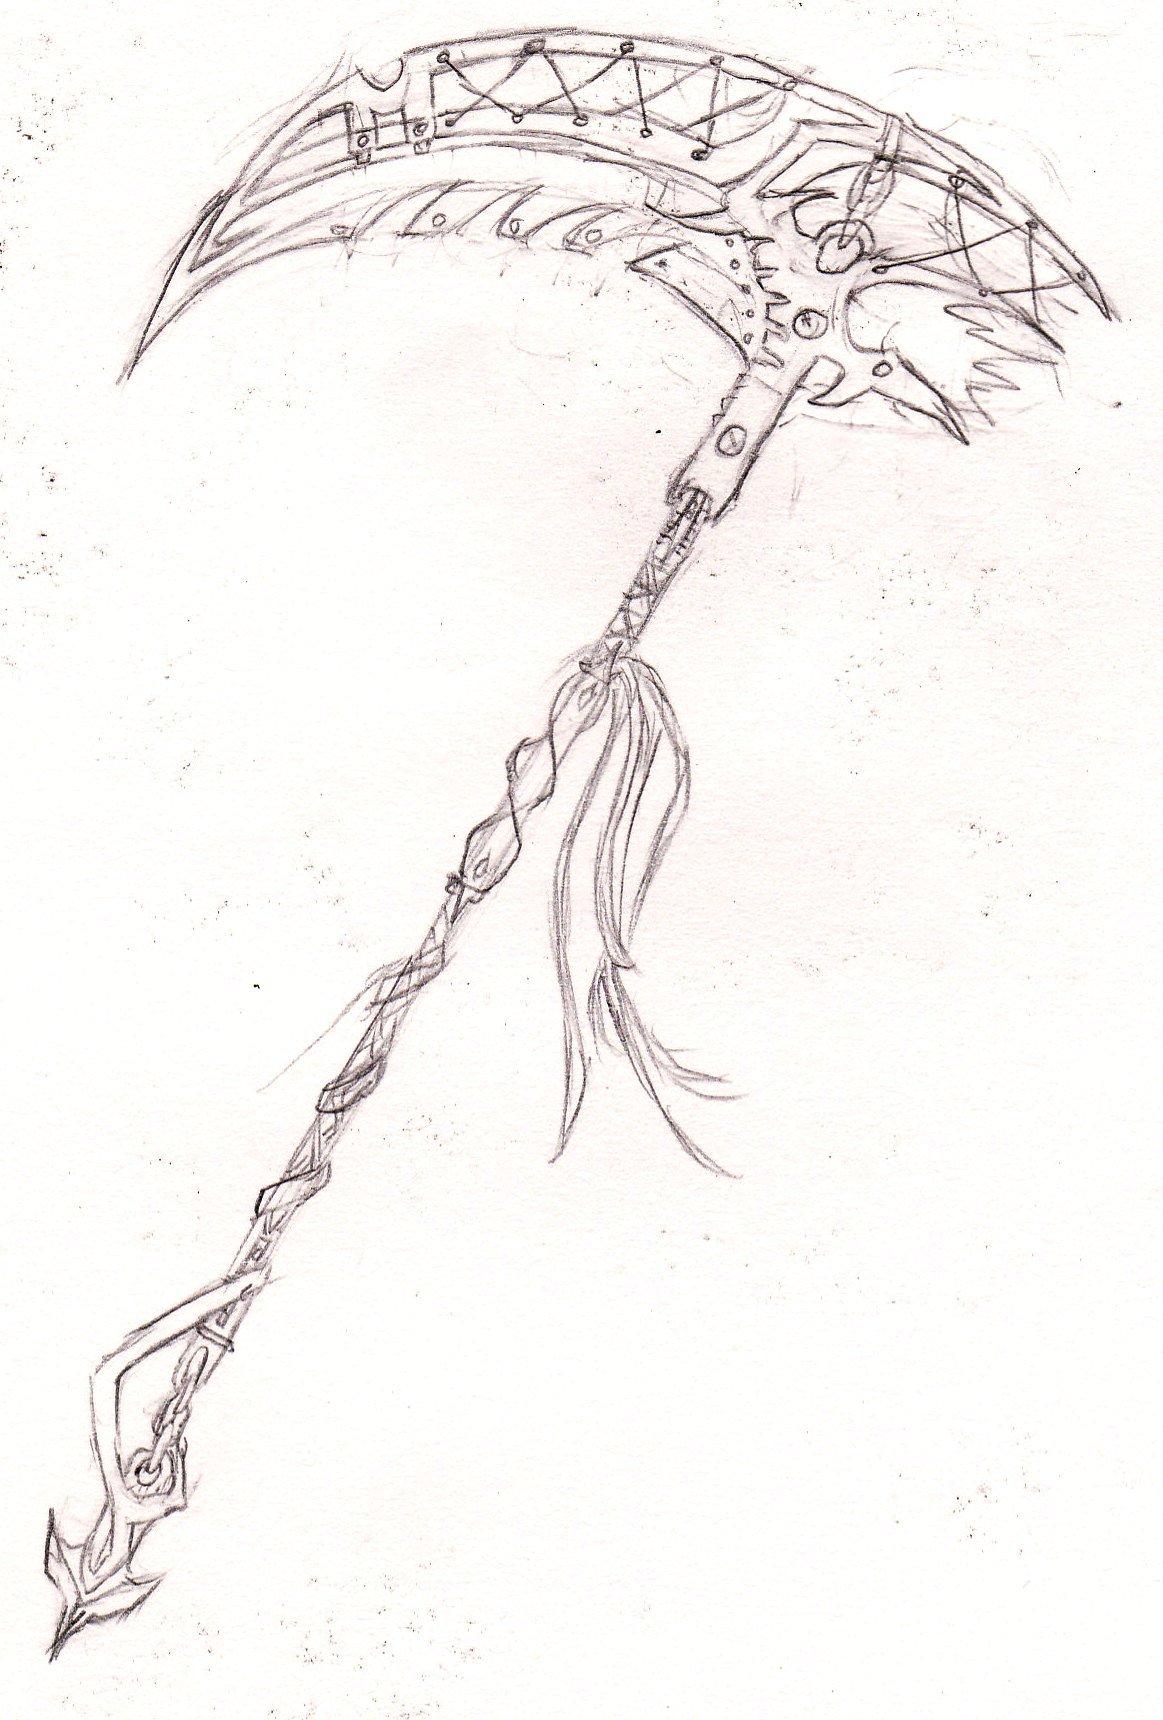 Drawn scythe angel Scythe darkelflord Sugar 369 favourites